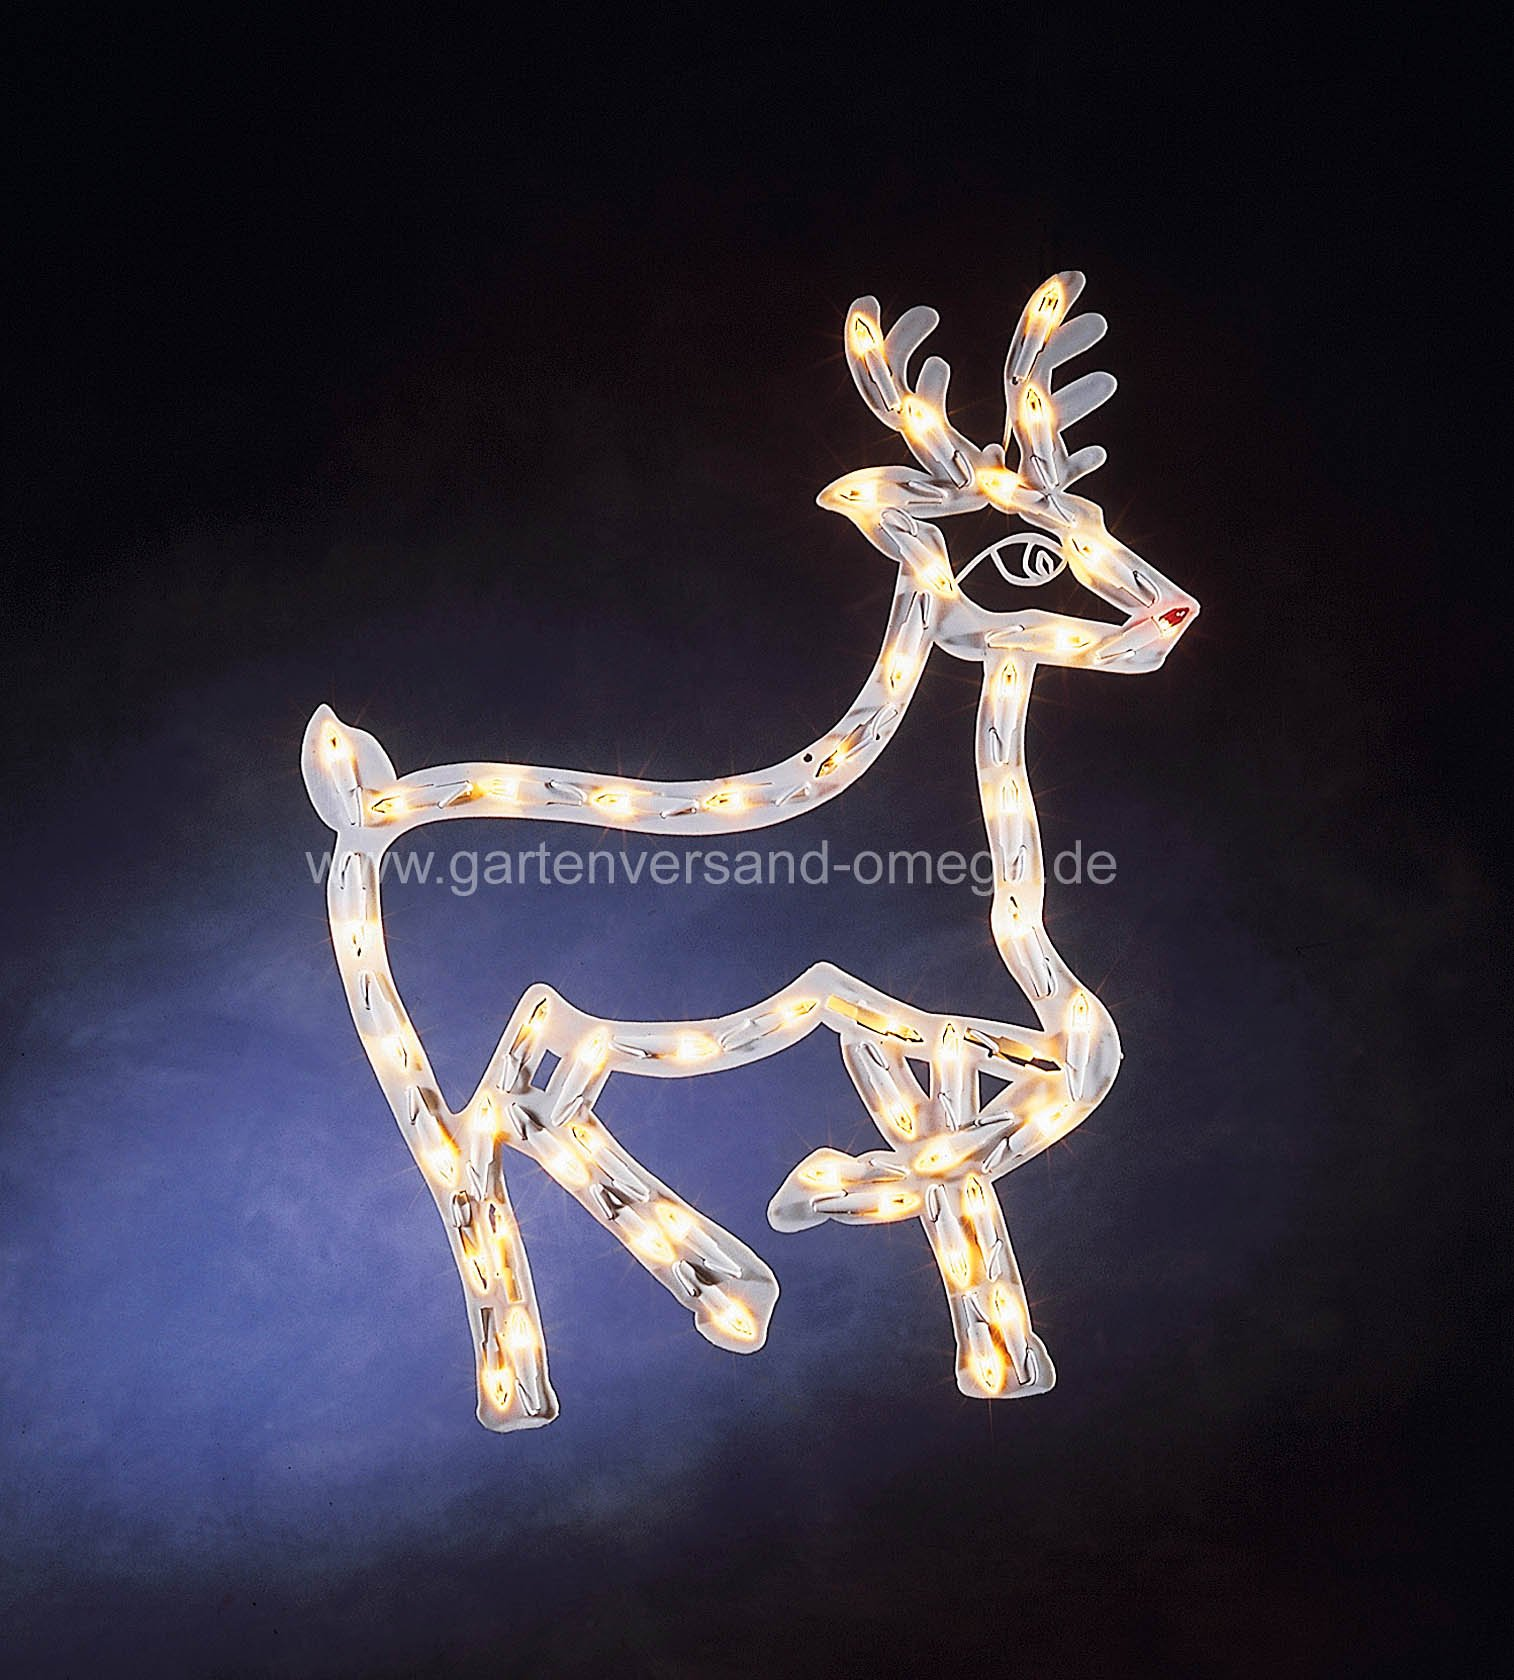 fenstersilhouette rentier weihnachtsbeleuchtung mit rentier weihnachtliche fensterbilder. Black Bedroom Furniture Sets. Home Design Ideas